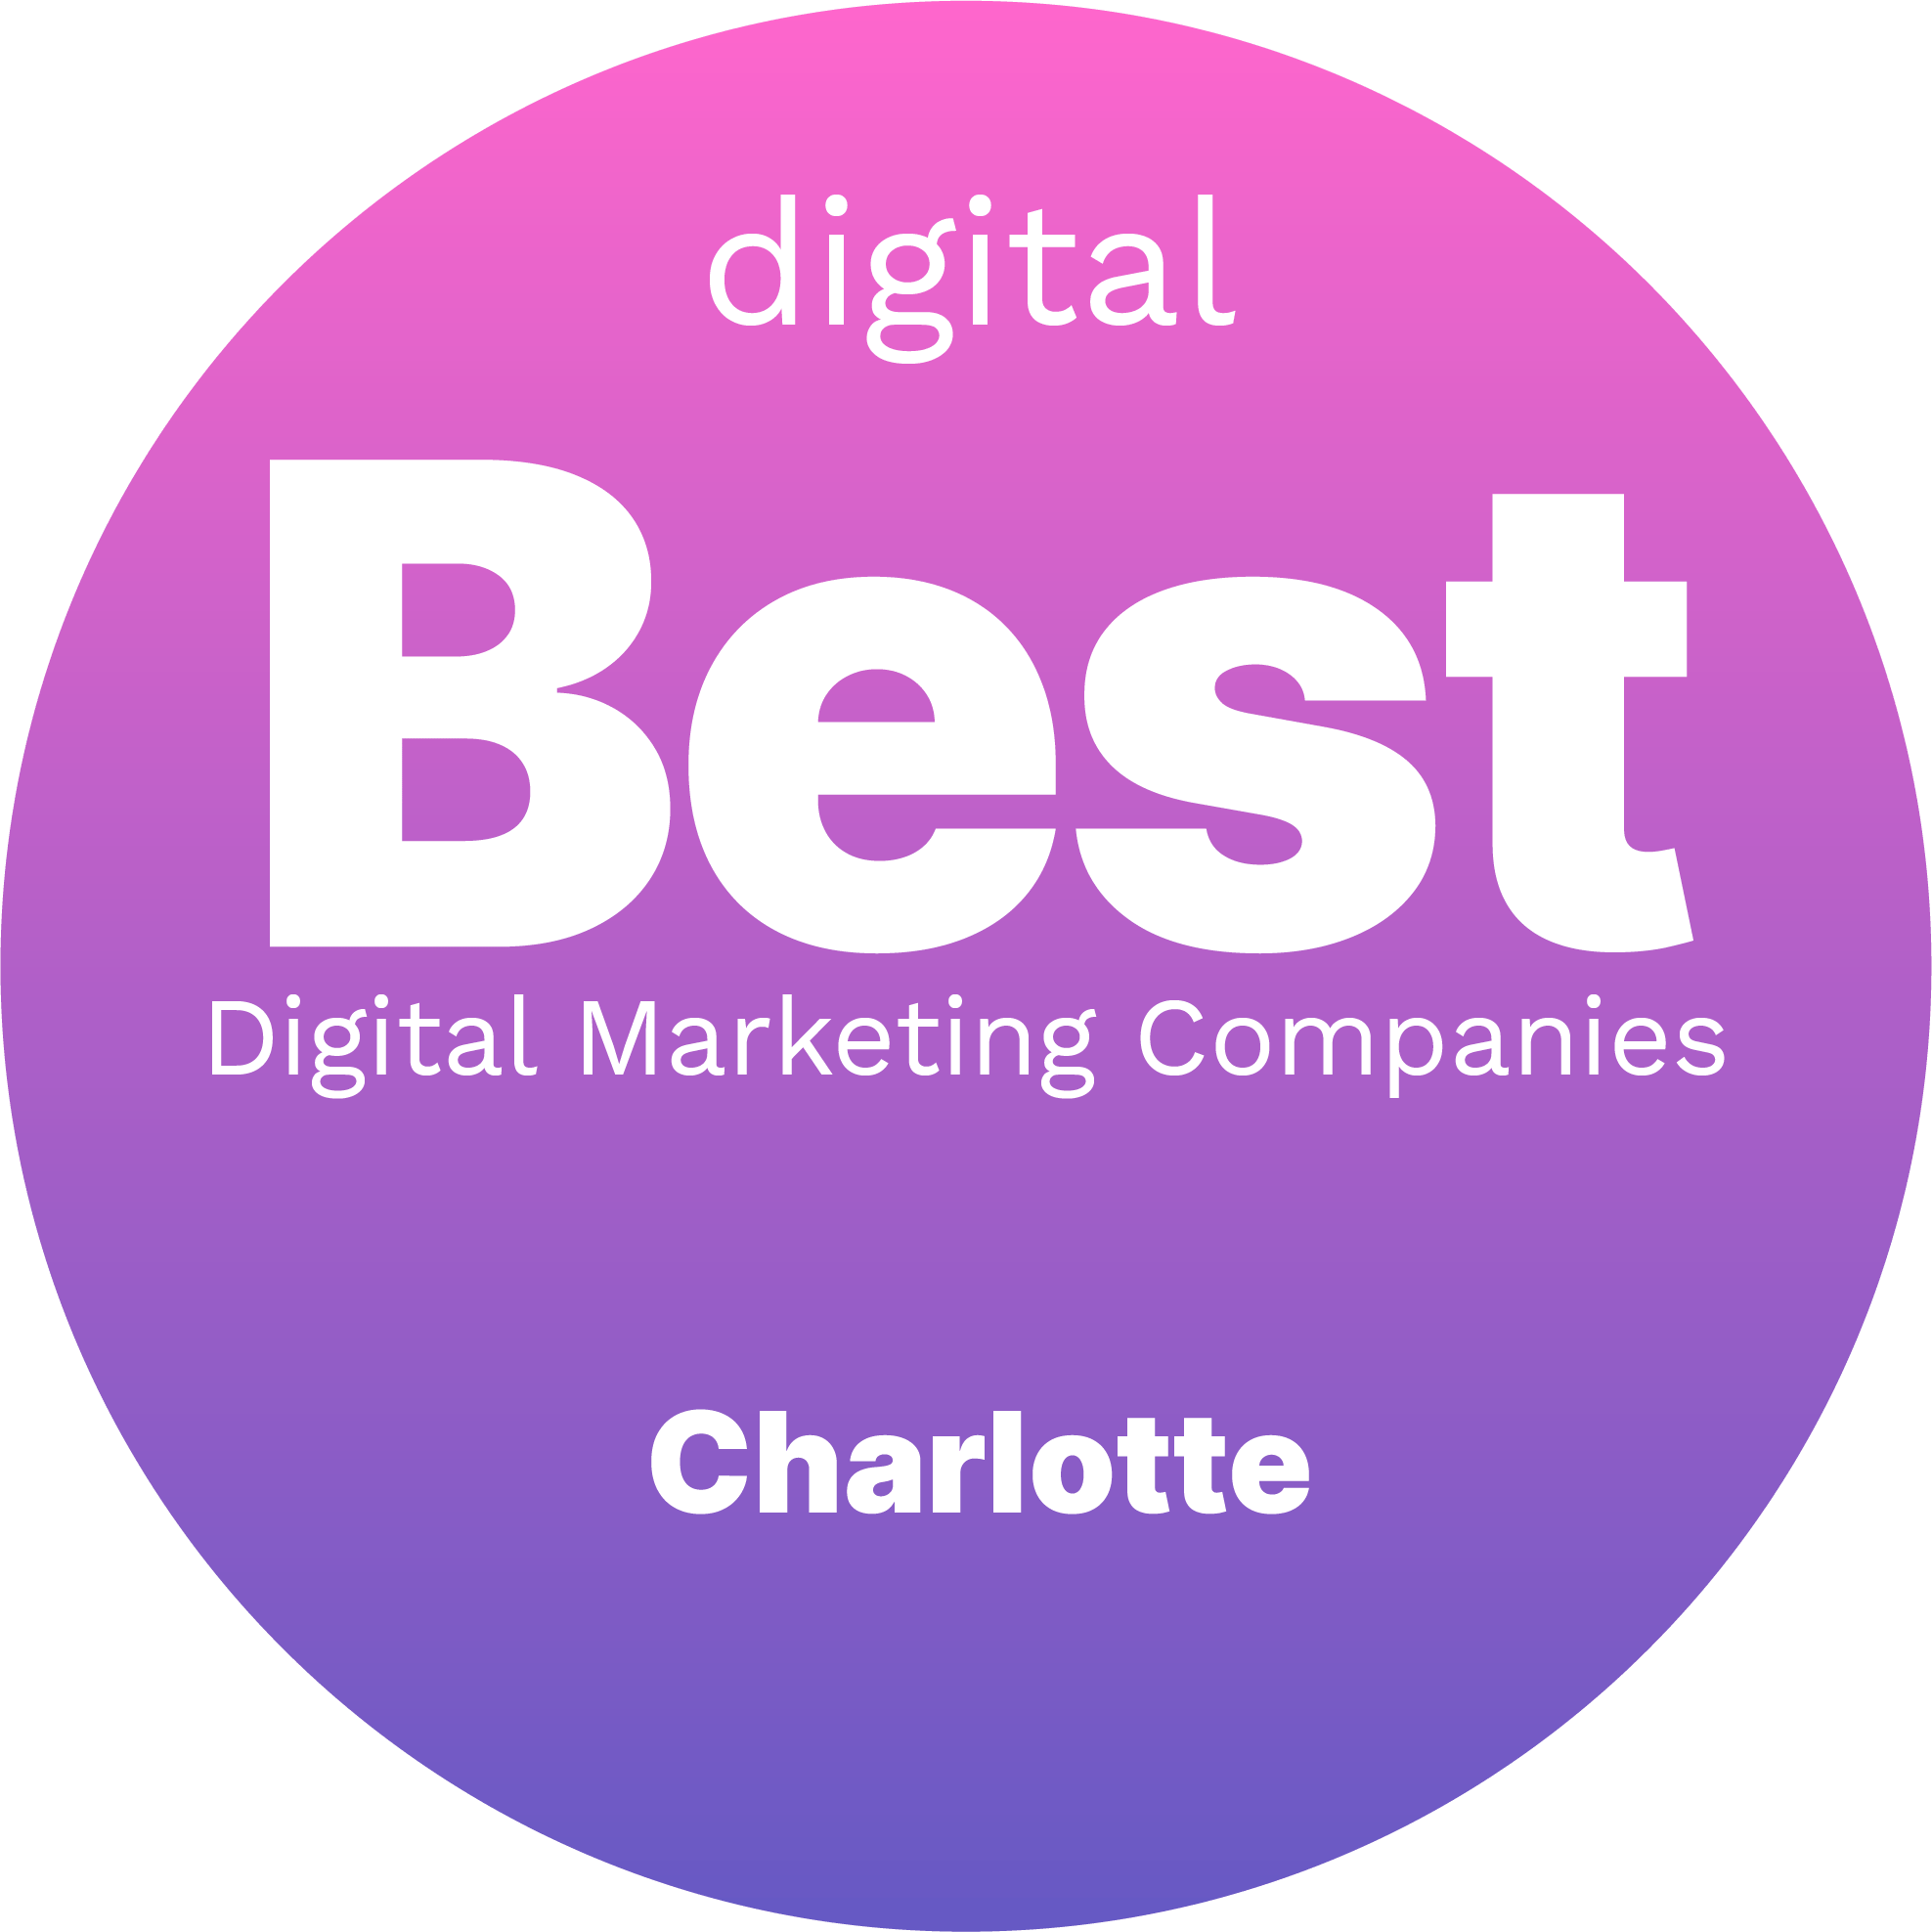 The Best Digital Marketing Companies in Charlotte Badge